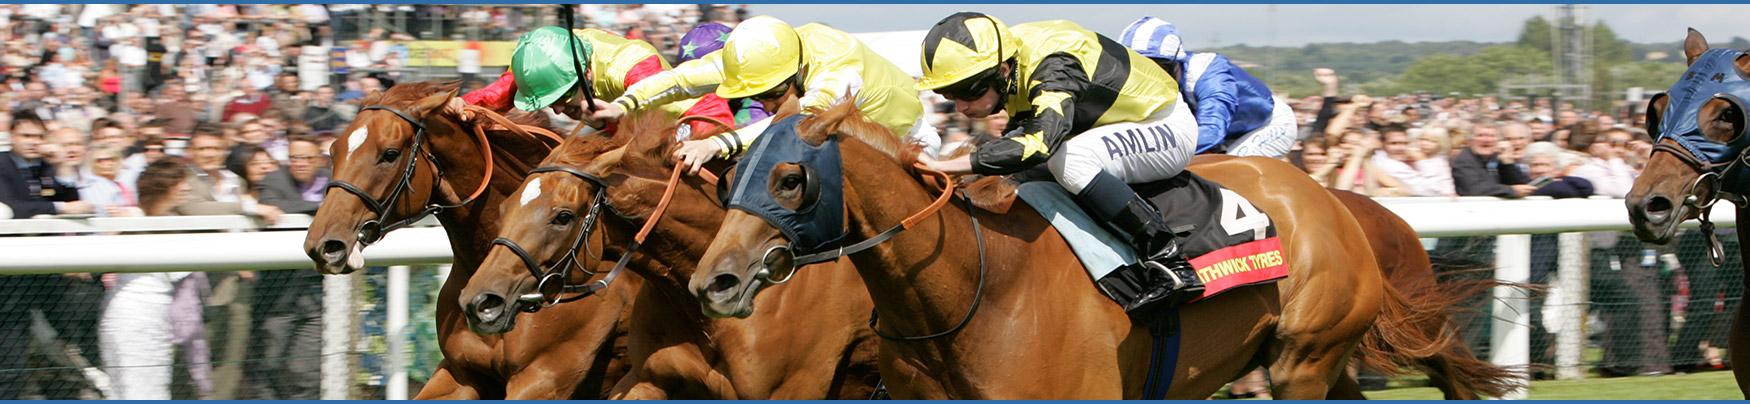 Association of Racecourse Veterinary Surgeons